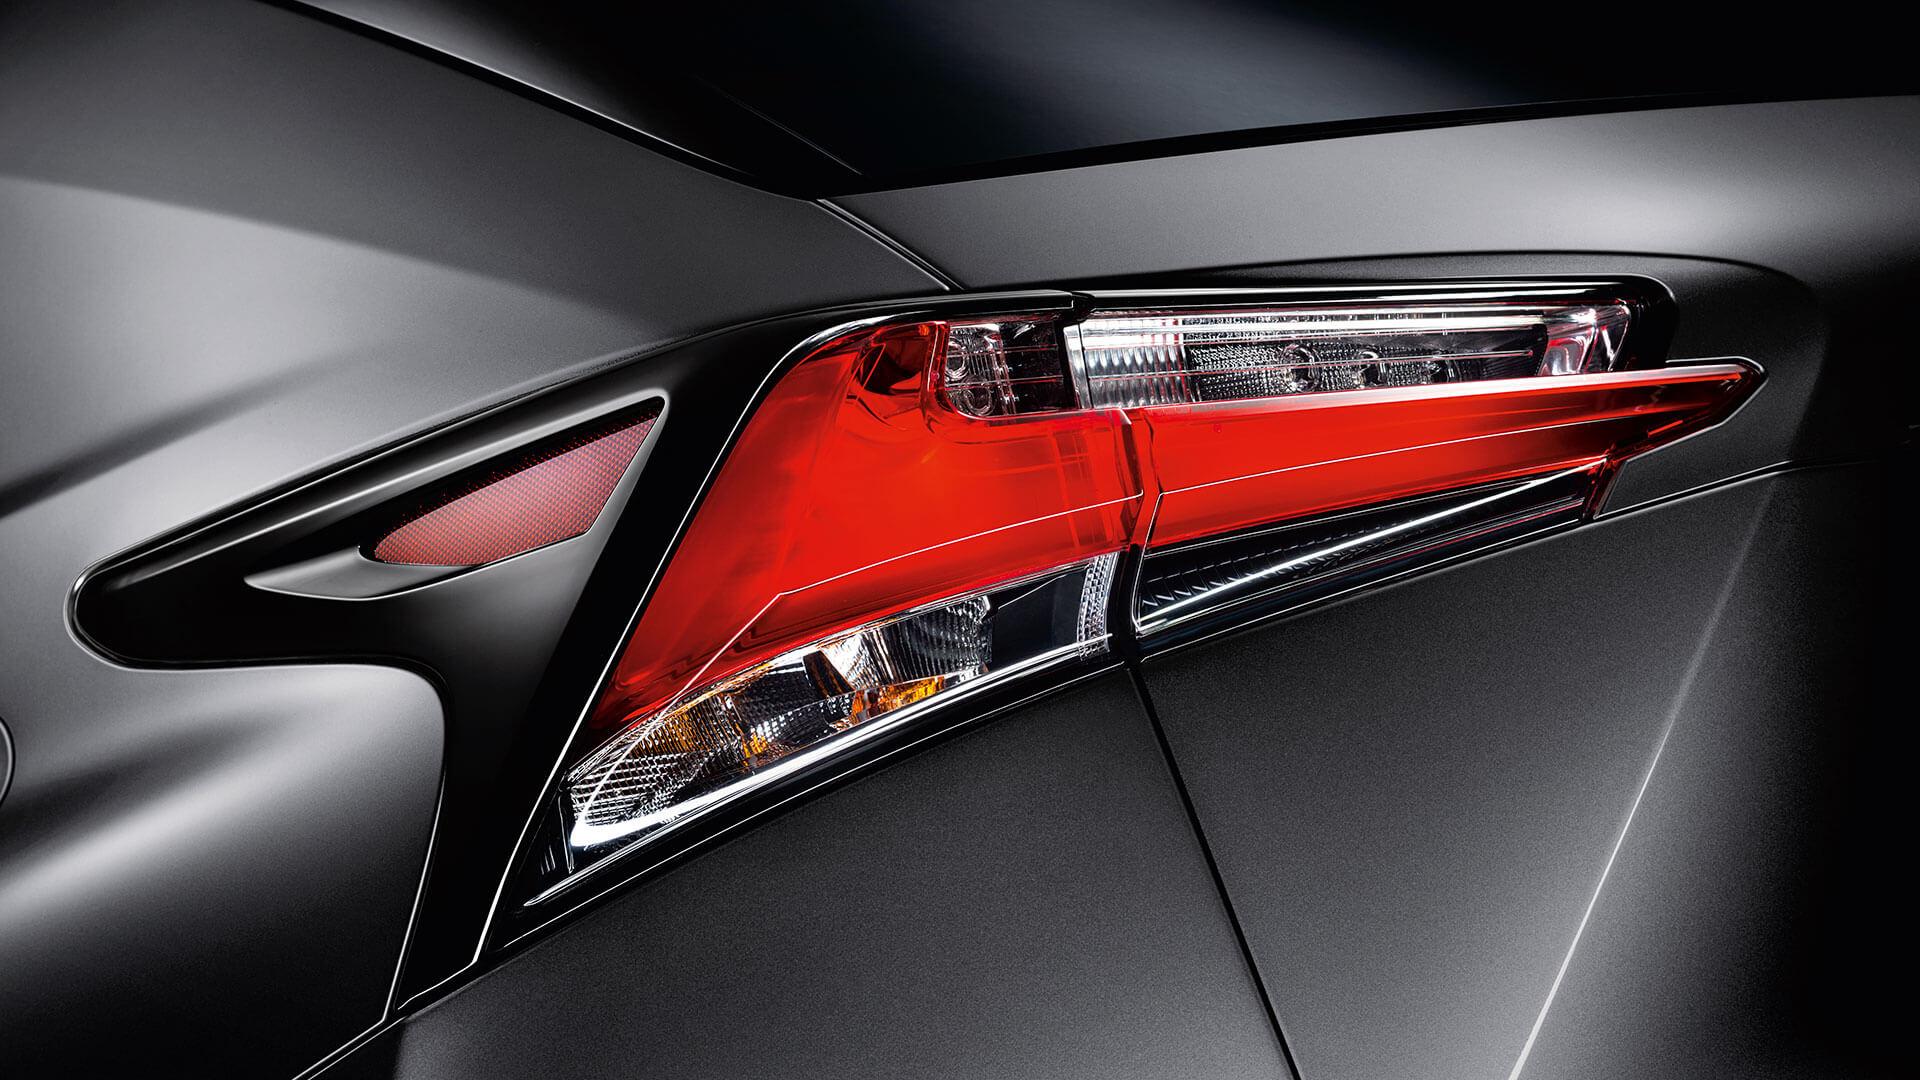 2017 lexus nx 300h features led rear lights